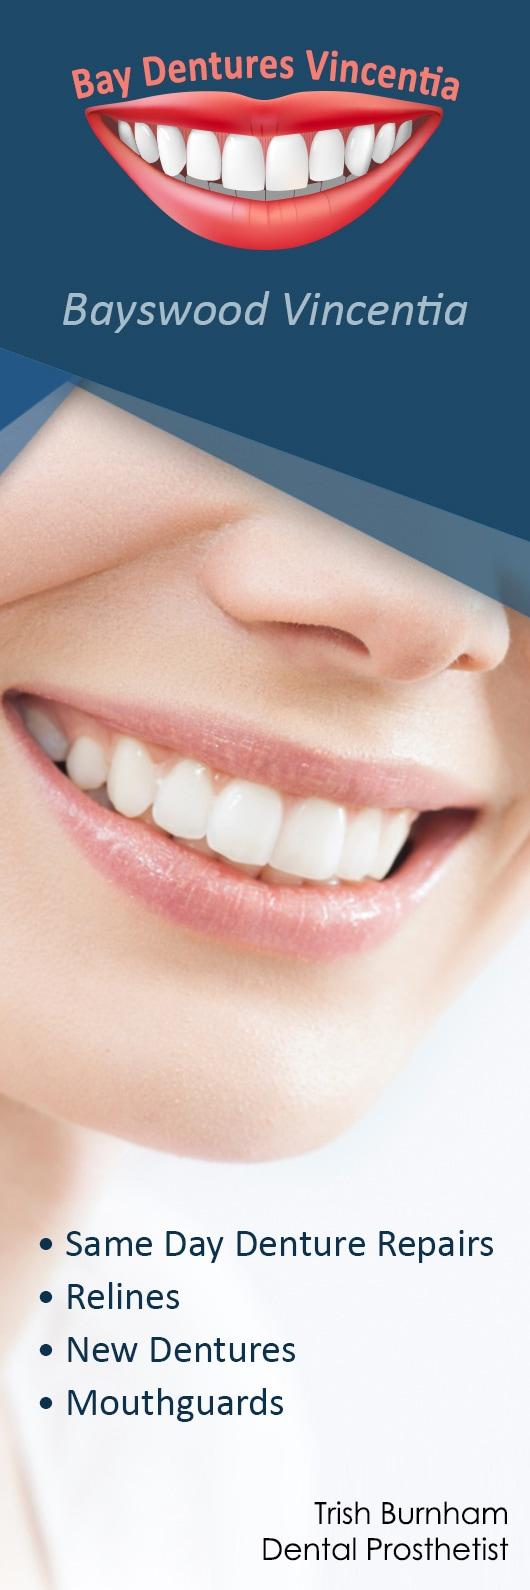 Bay Dentures Vincentia - Dental Prosthetist - 32B The Wool Rd